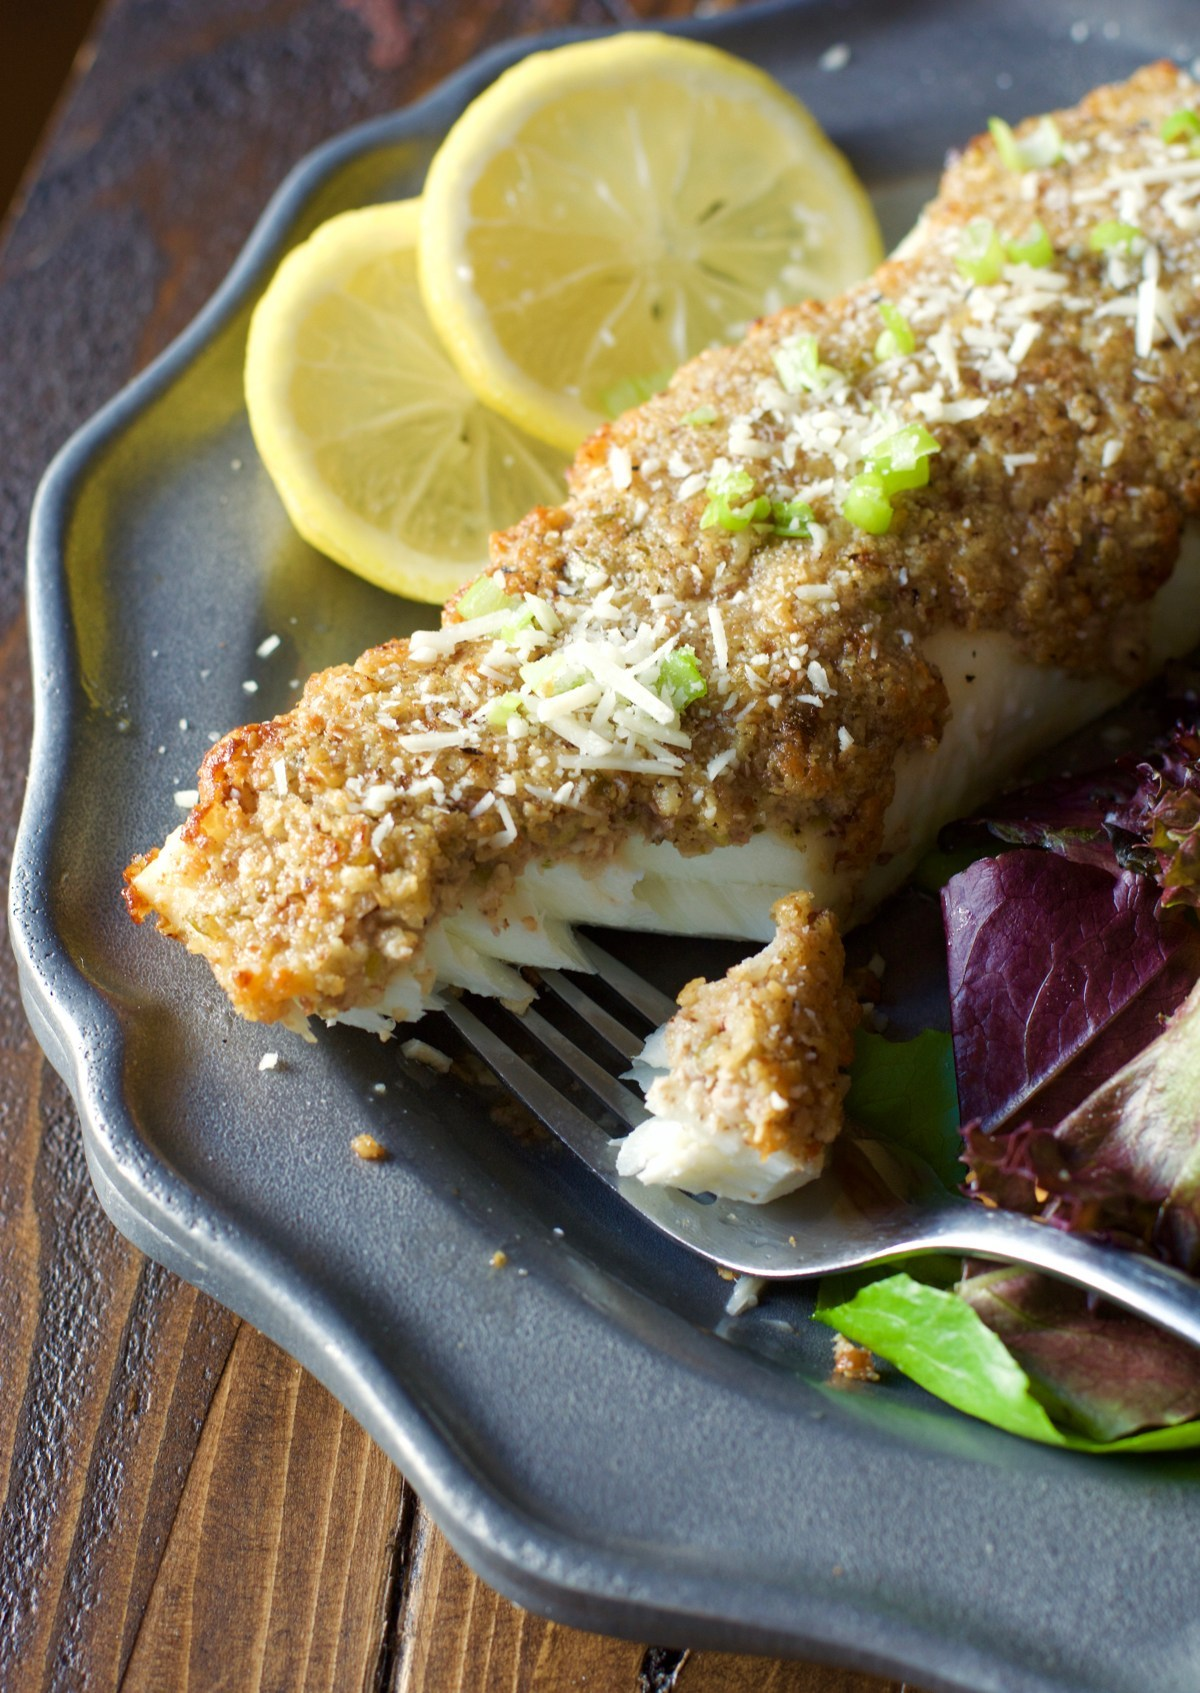 15+ Easy Keto Dinner recipes under 6 net carbs each! #keto #lowcarbrecipes